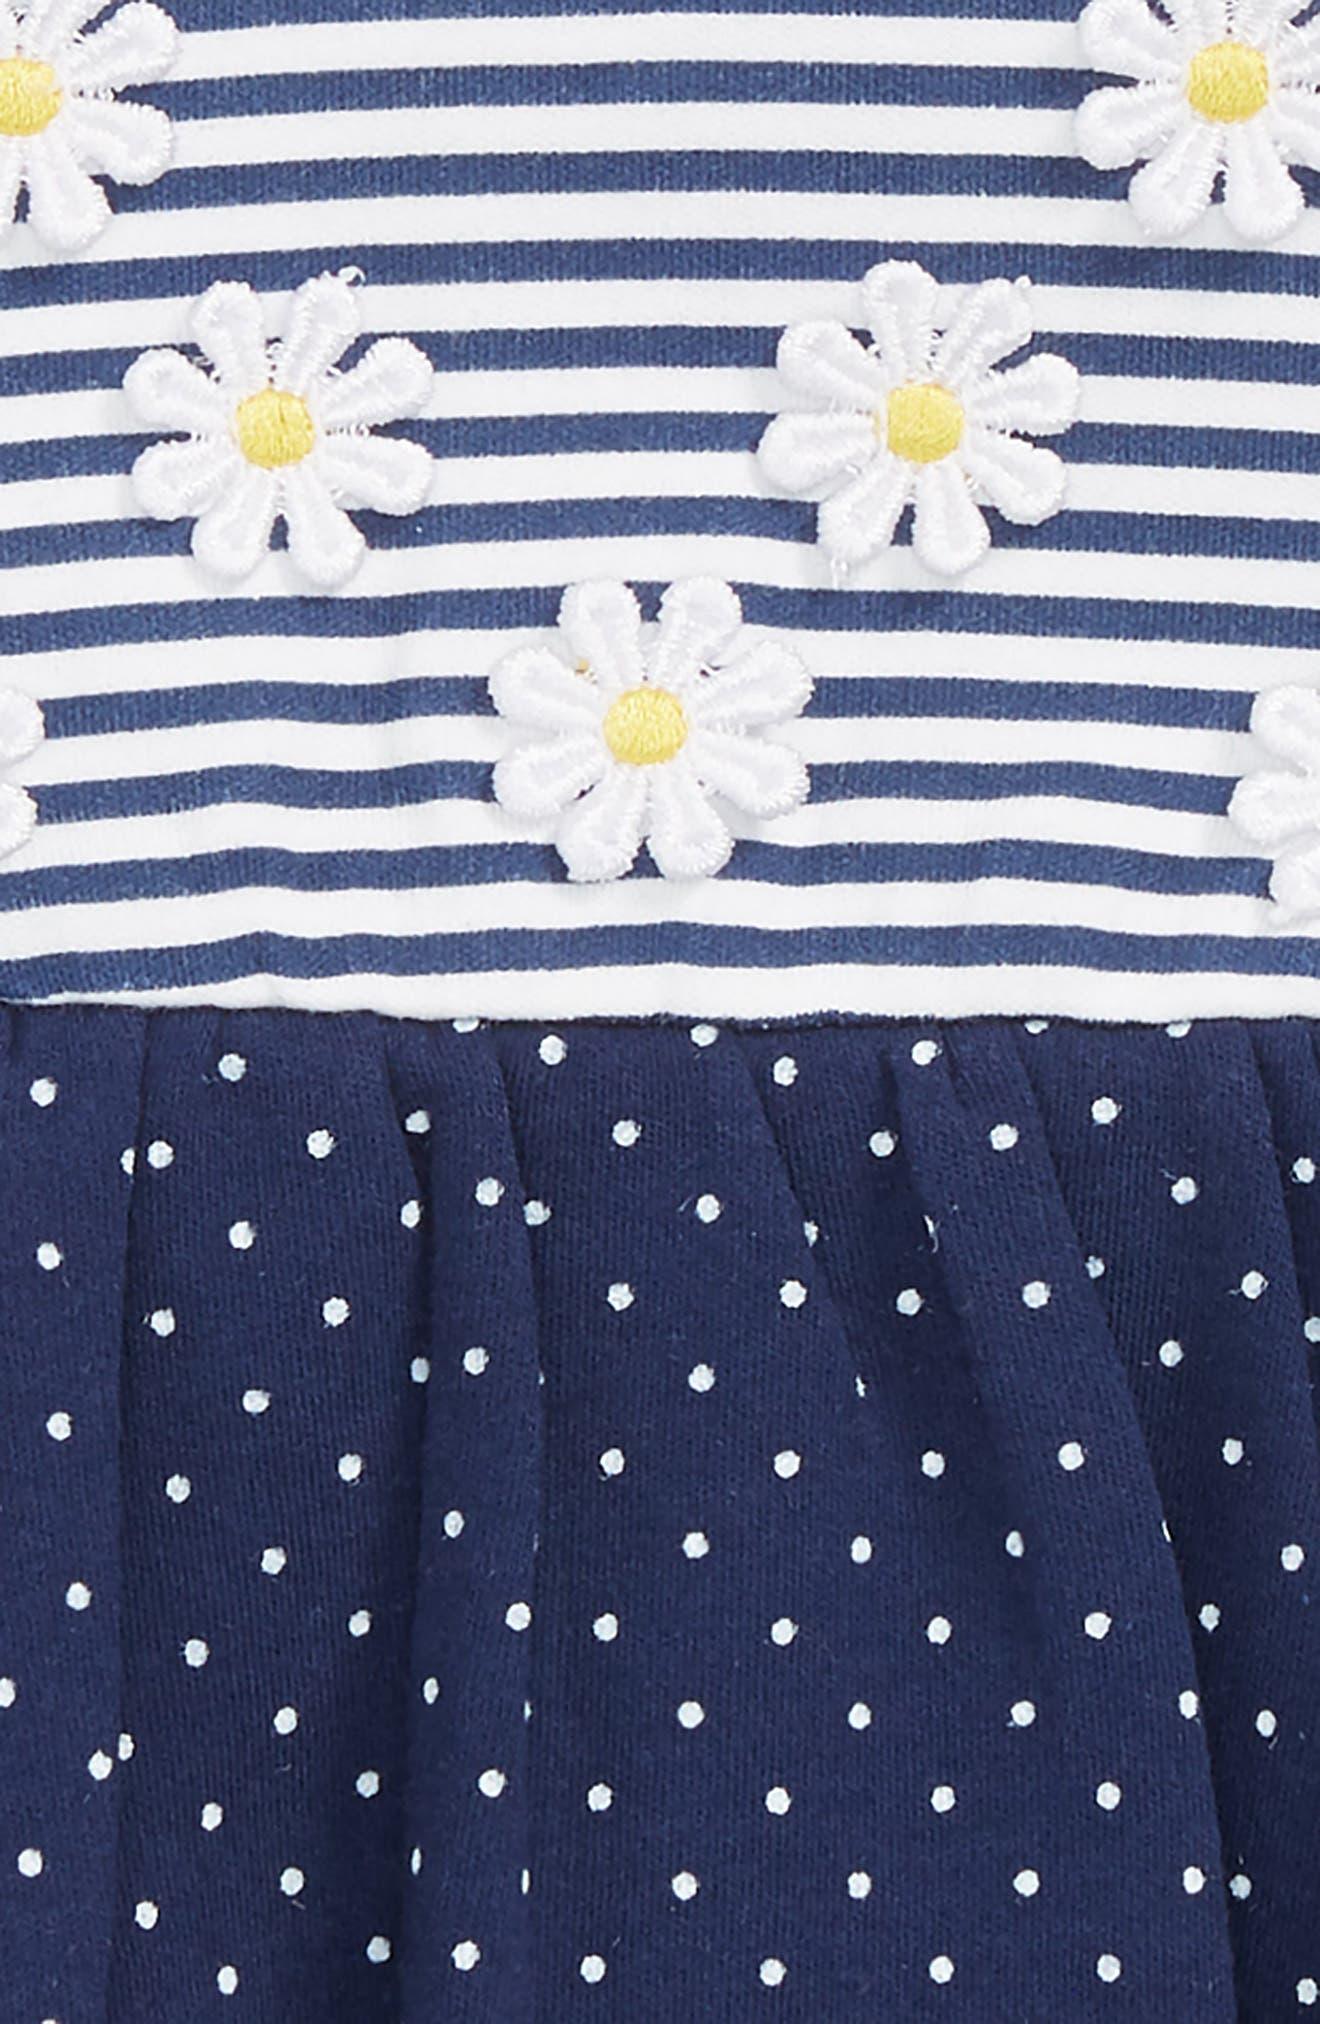 Daisy Dots Popover Bodysuit & Sun Hat Set,                             Alternate thumbnail 2, color,                             Navy